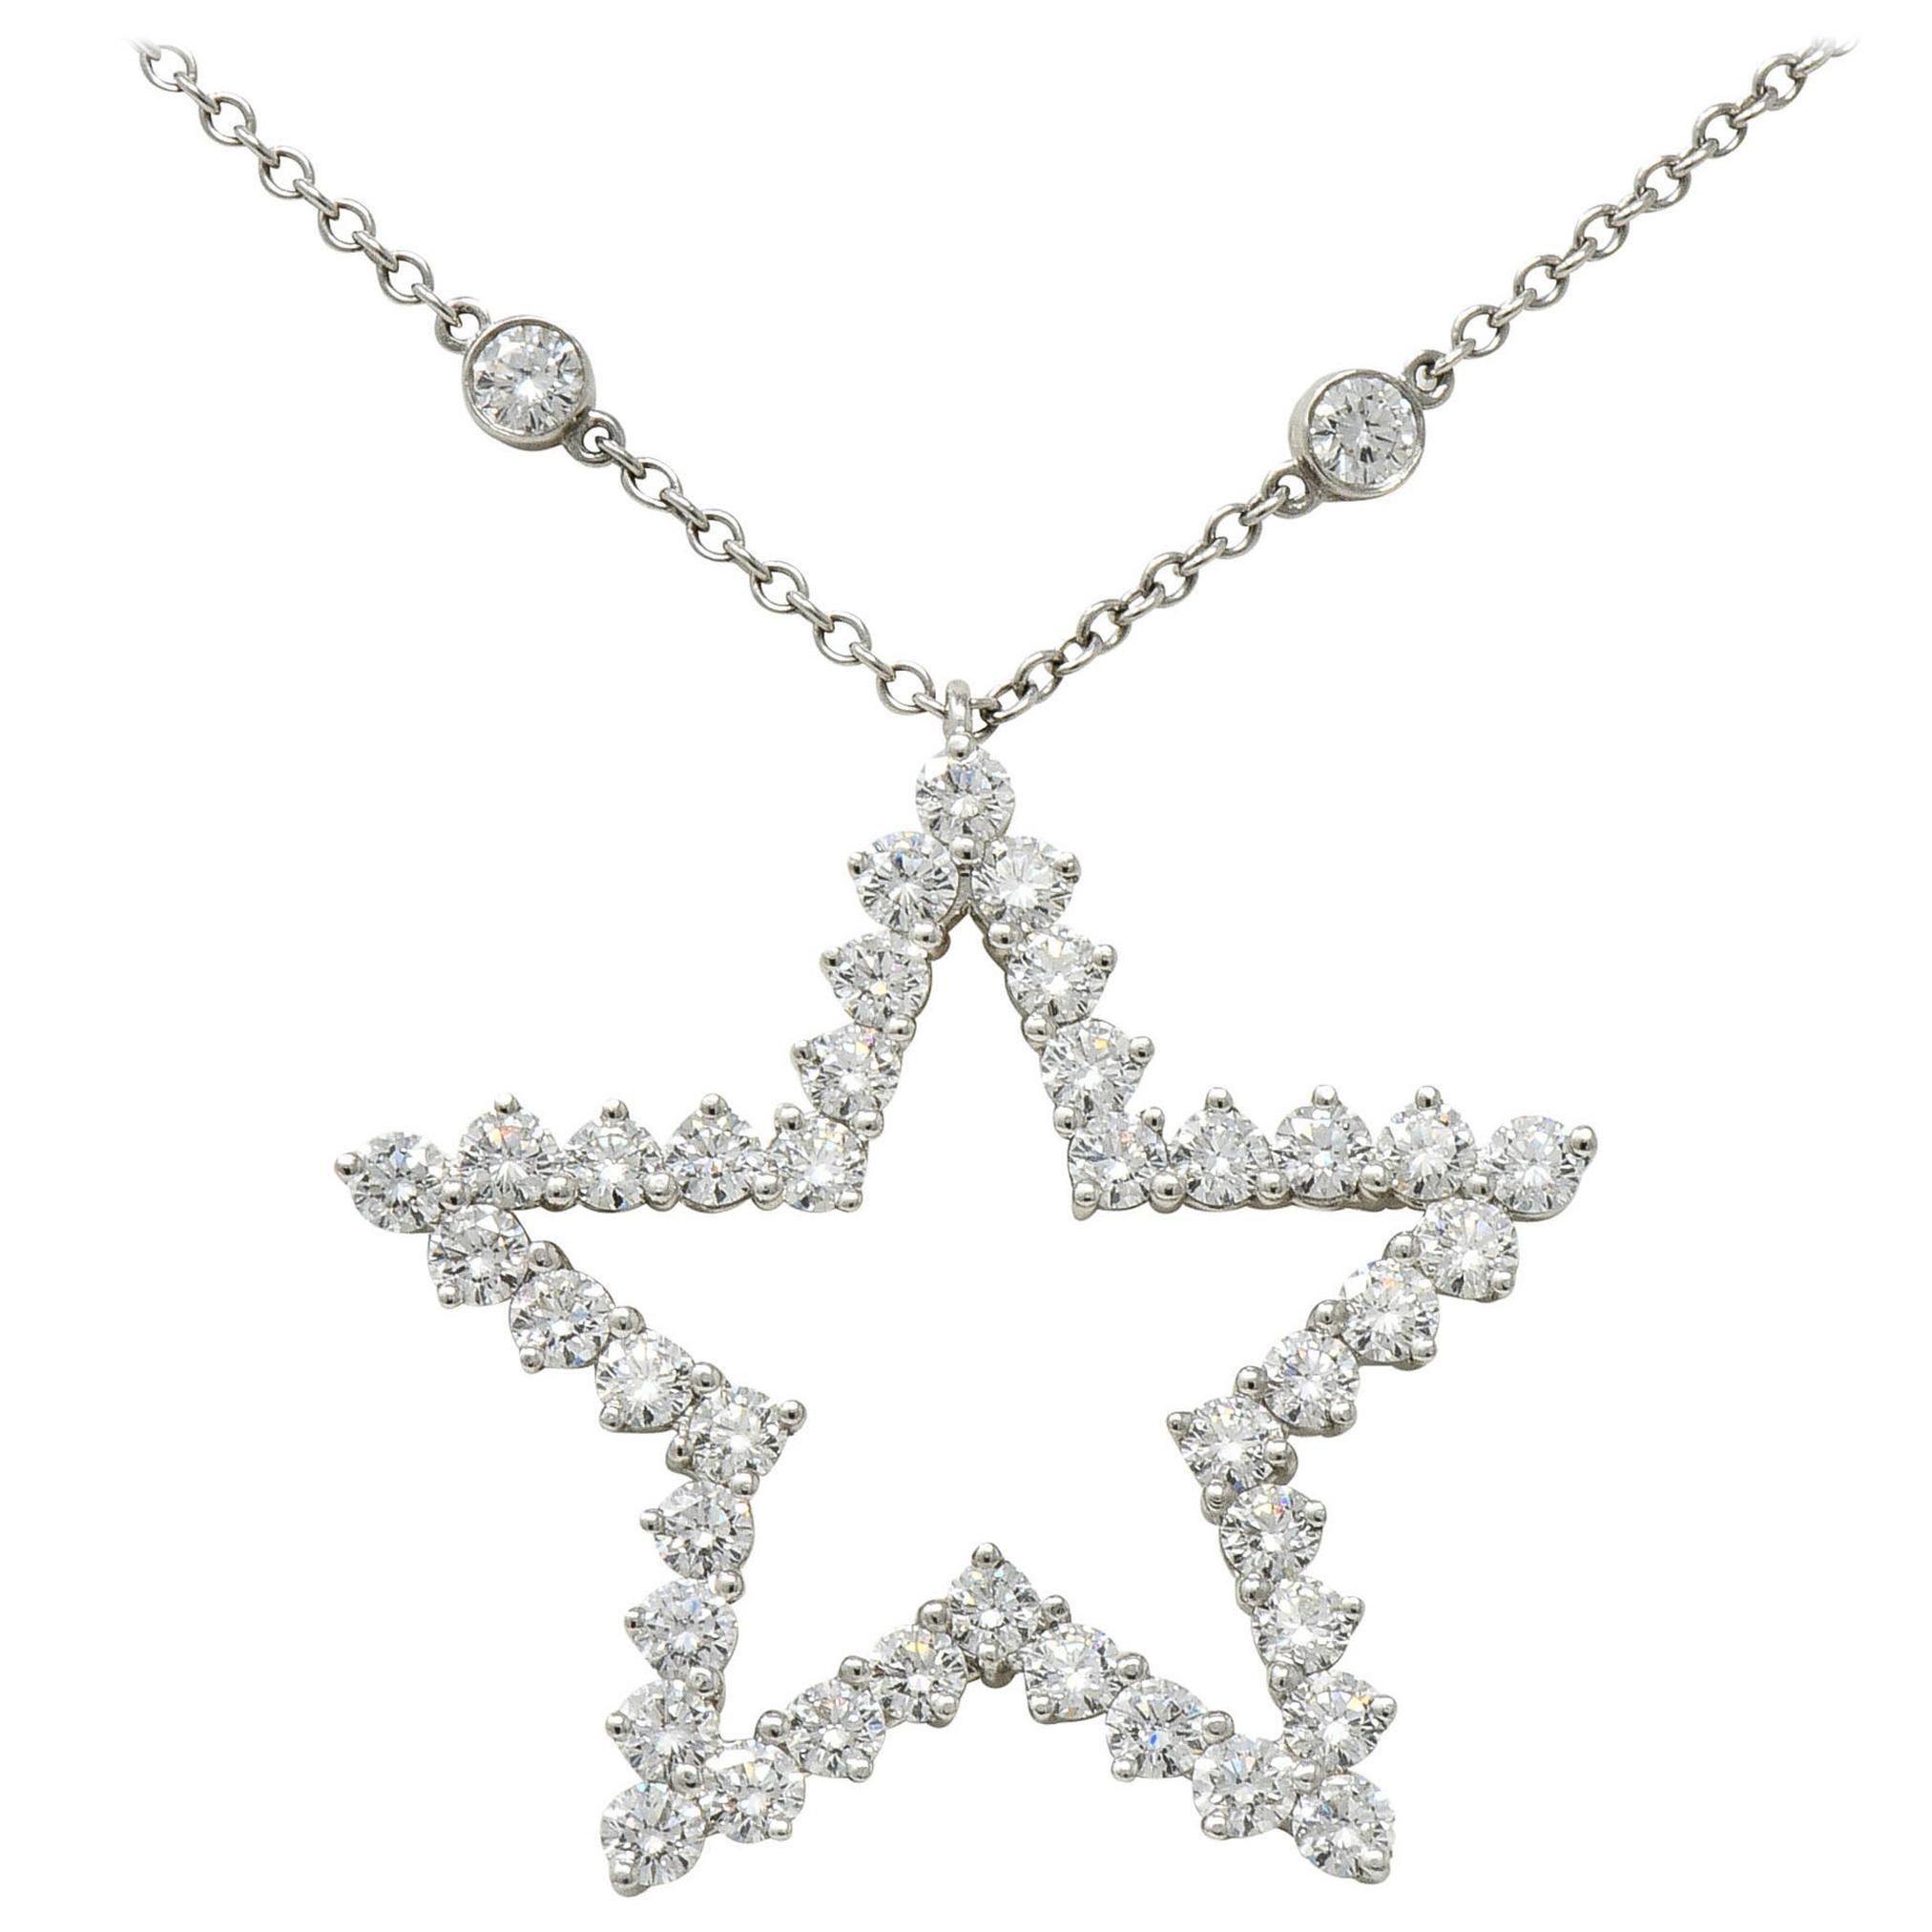 Tiffany & Co. 5.56 Carat Diamond Platinum Diamonds-By-The-Yard Star Necklace